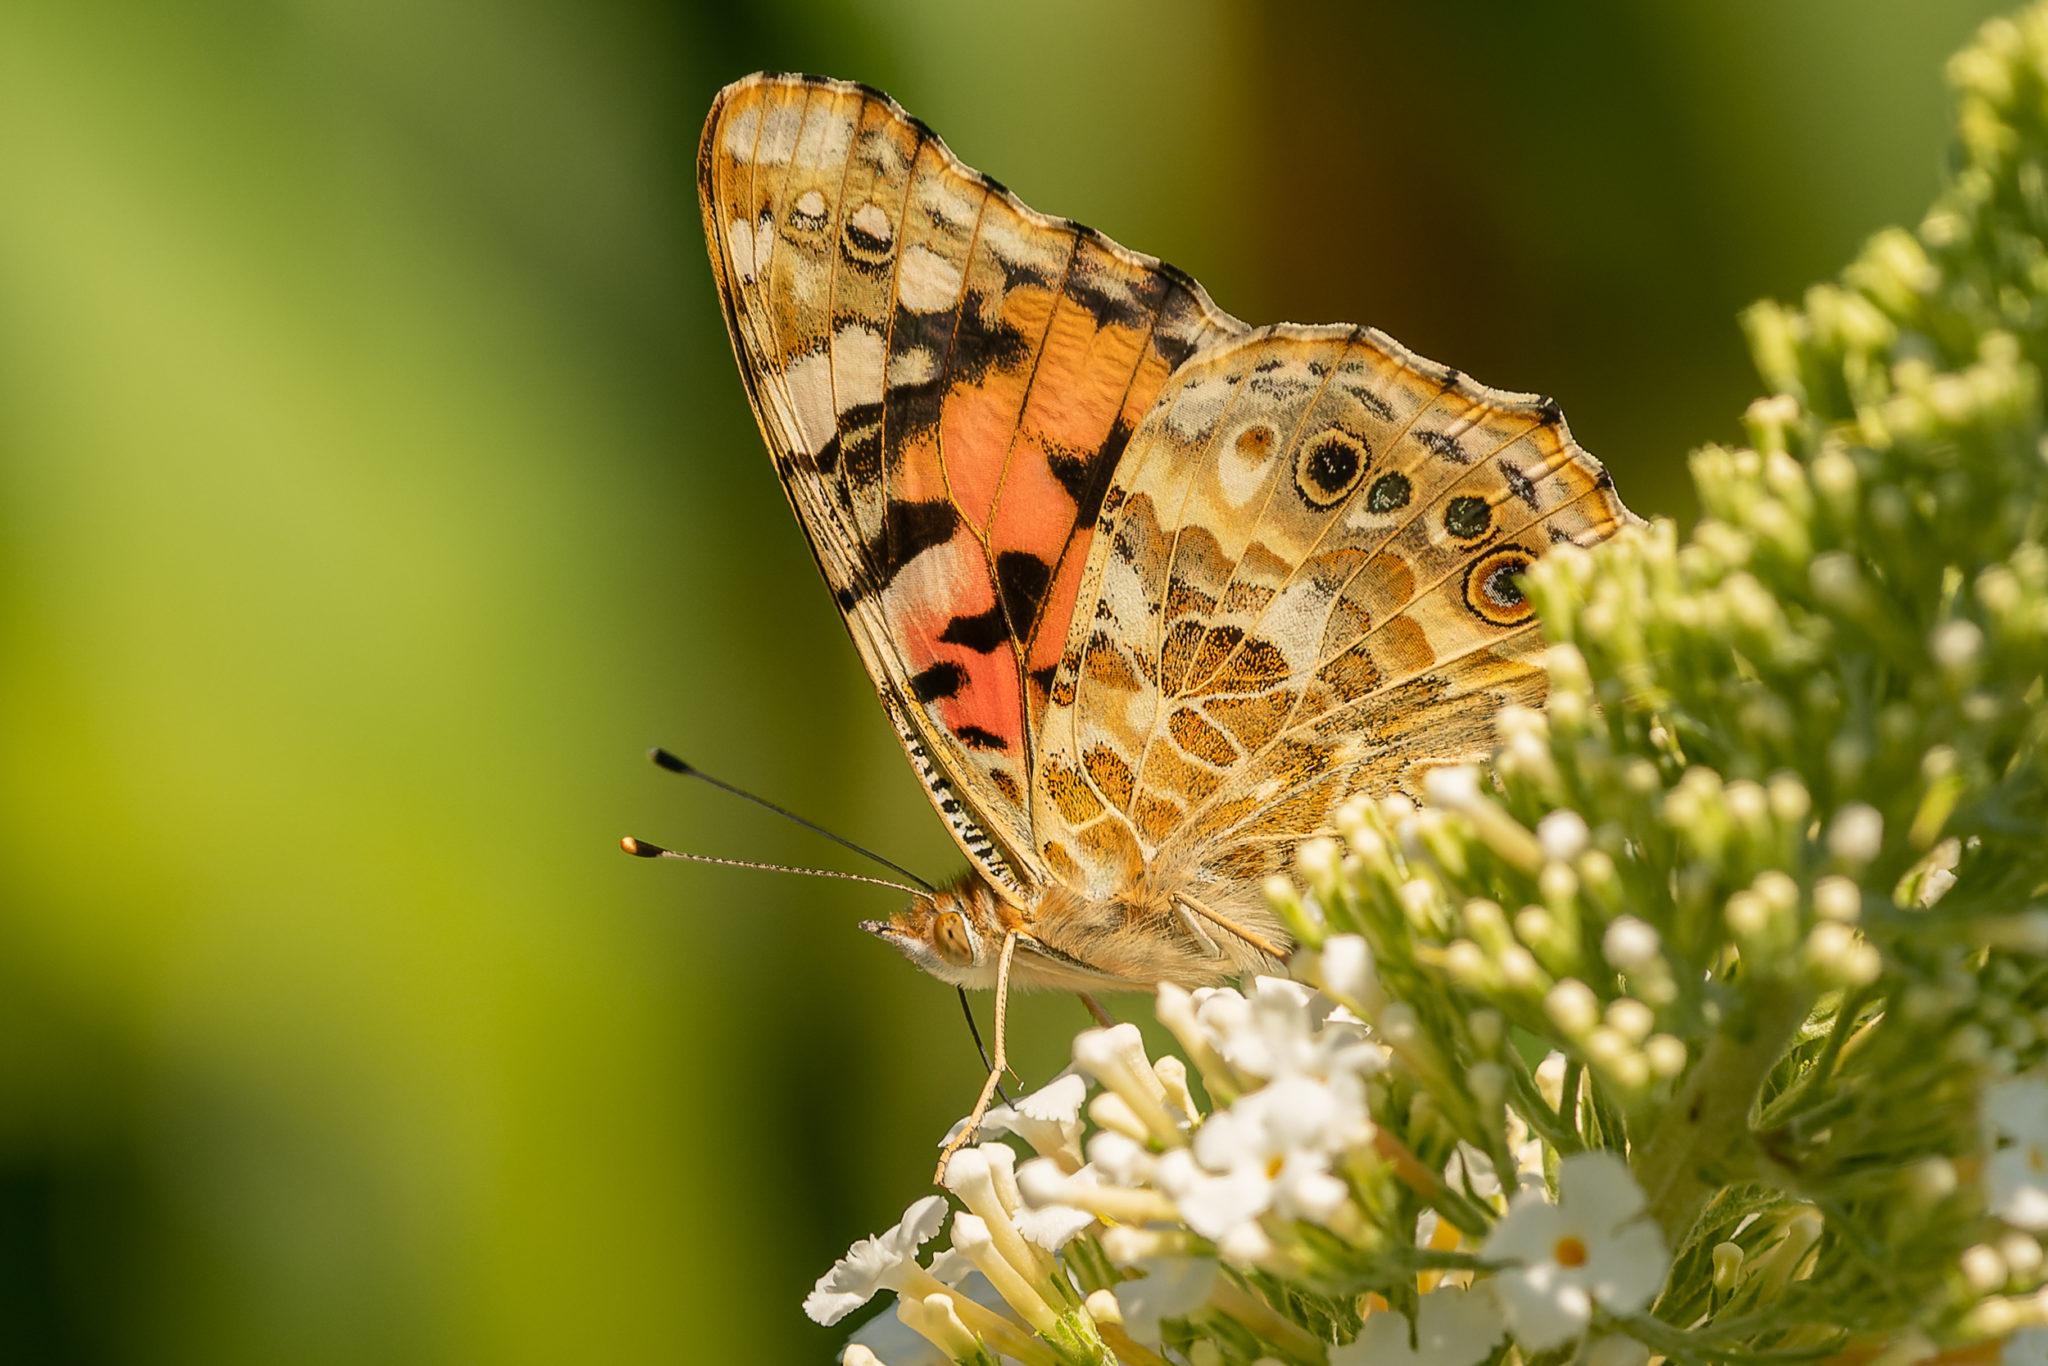 Distelfalter (Vanessa cardui), Naturfotografie Sylvia & Olaf Rentzsch